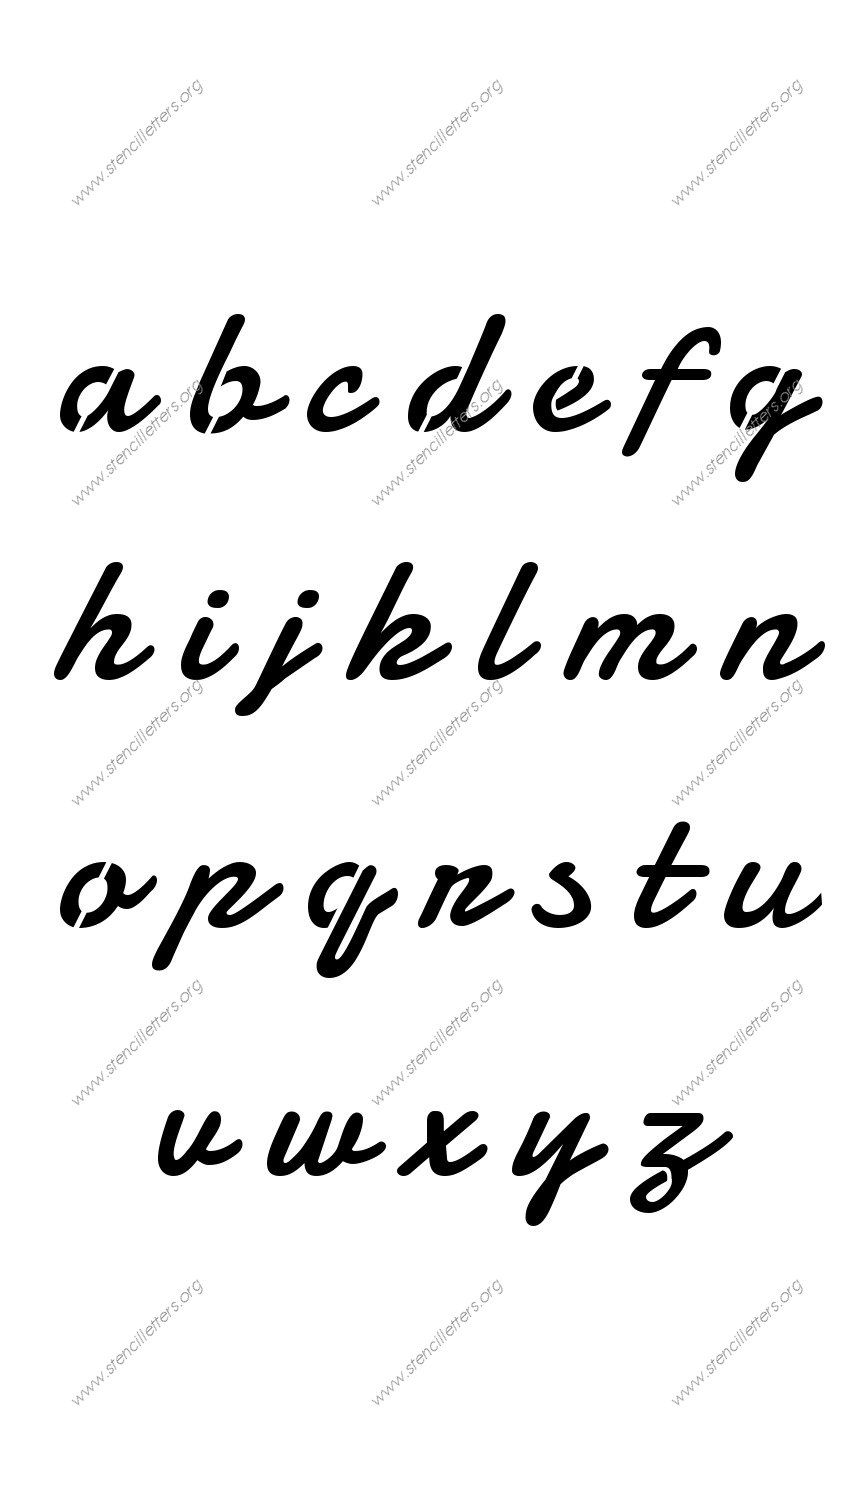 Display Script Cursive A to Z lowercase letter stencils ...